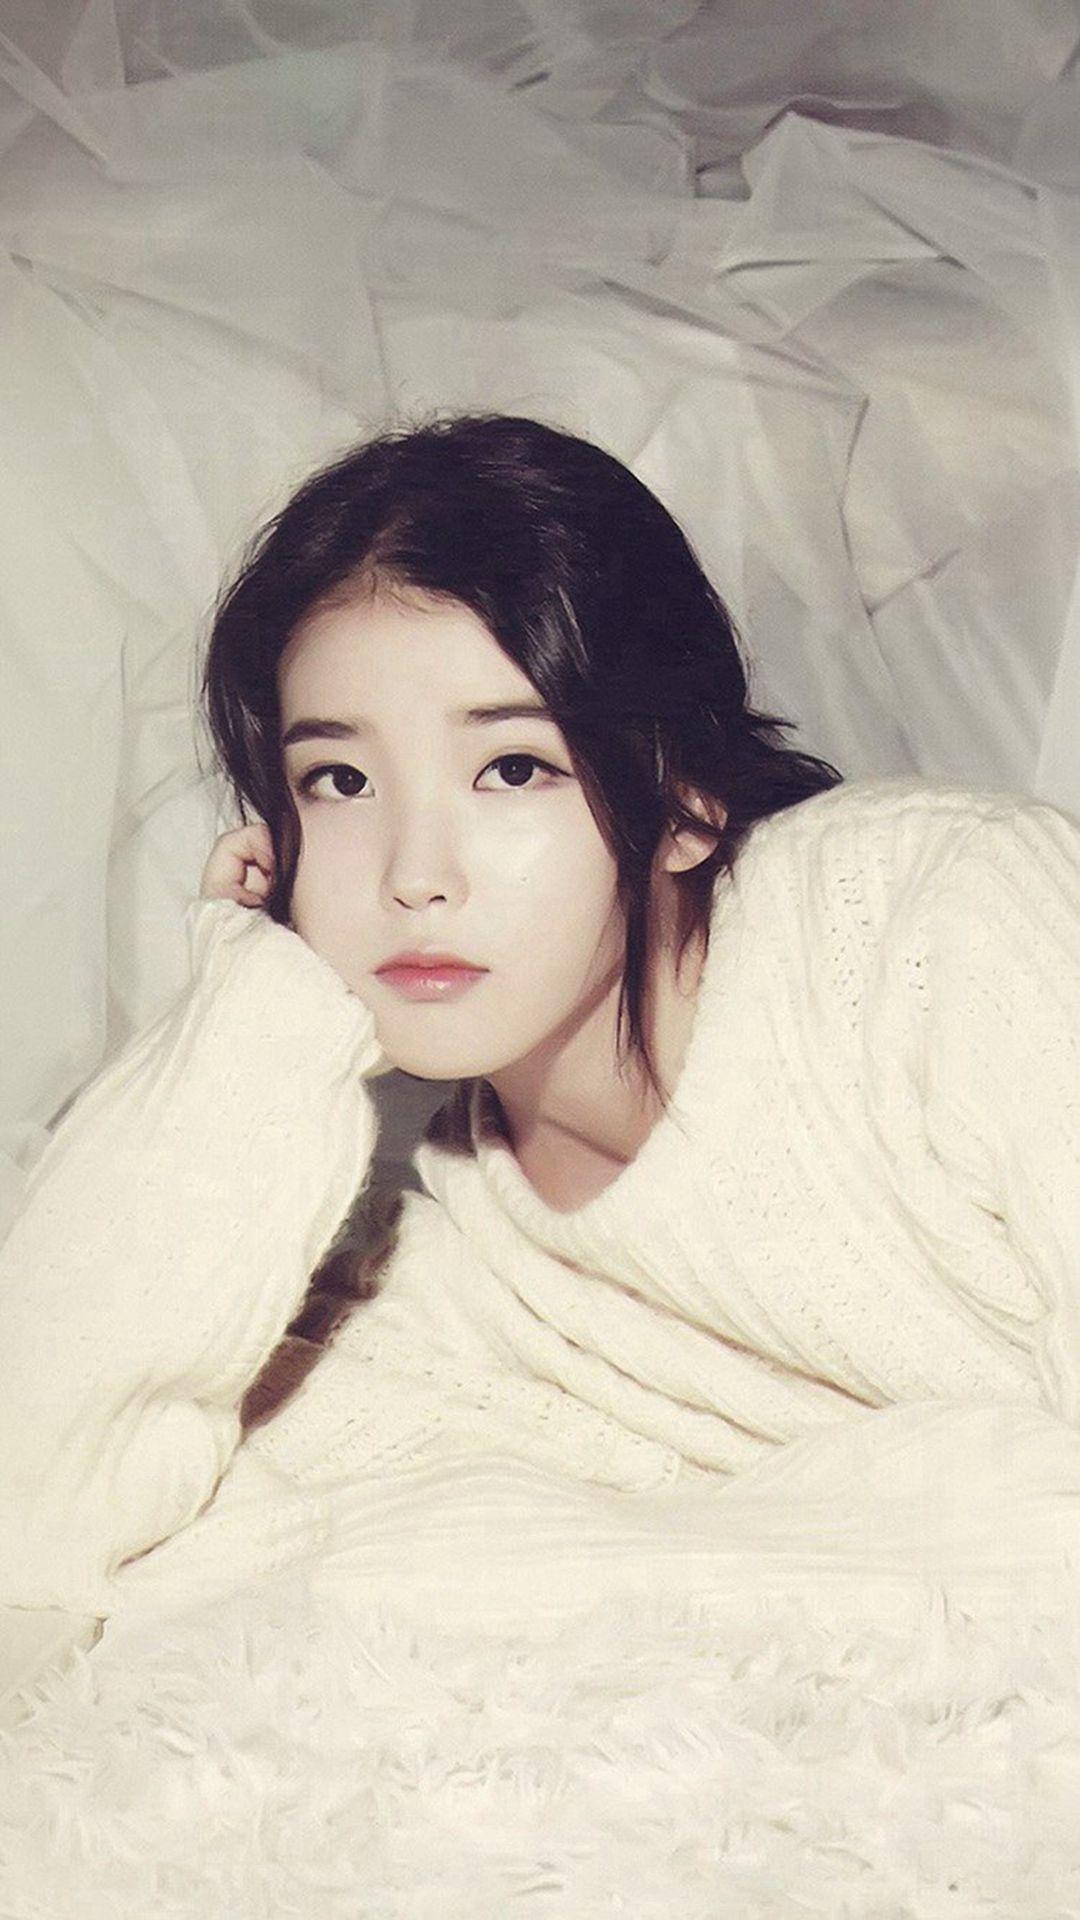 Iu Kpop Girl Cute Photography Iphone 6 Plus Wallpaper Iphone 6